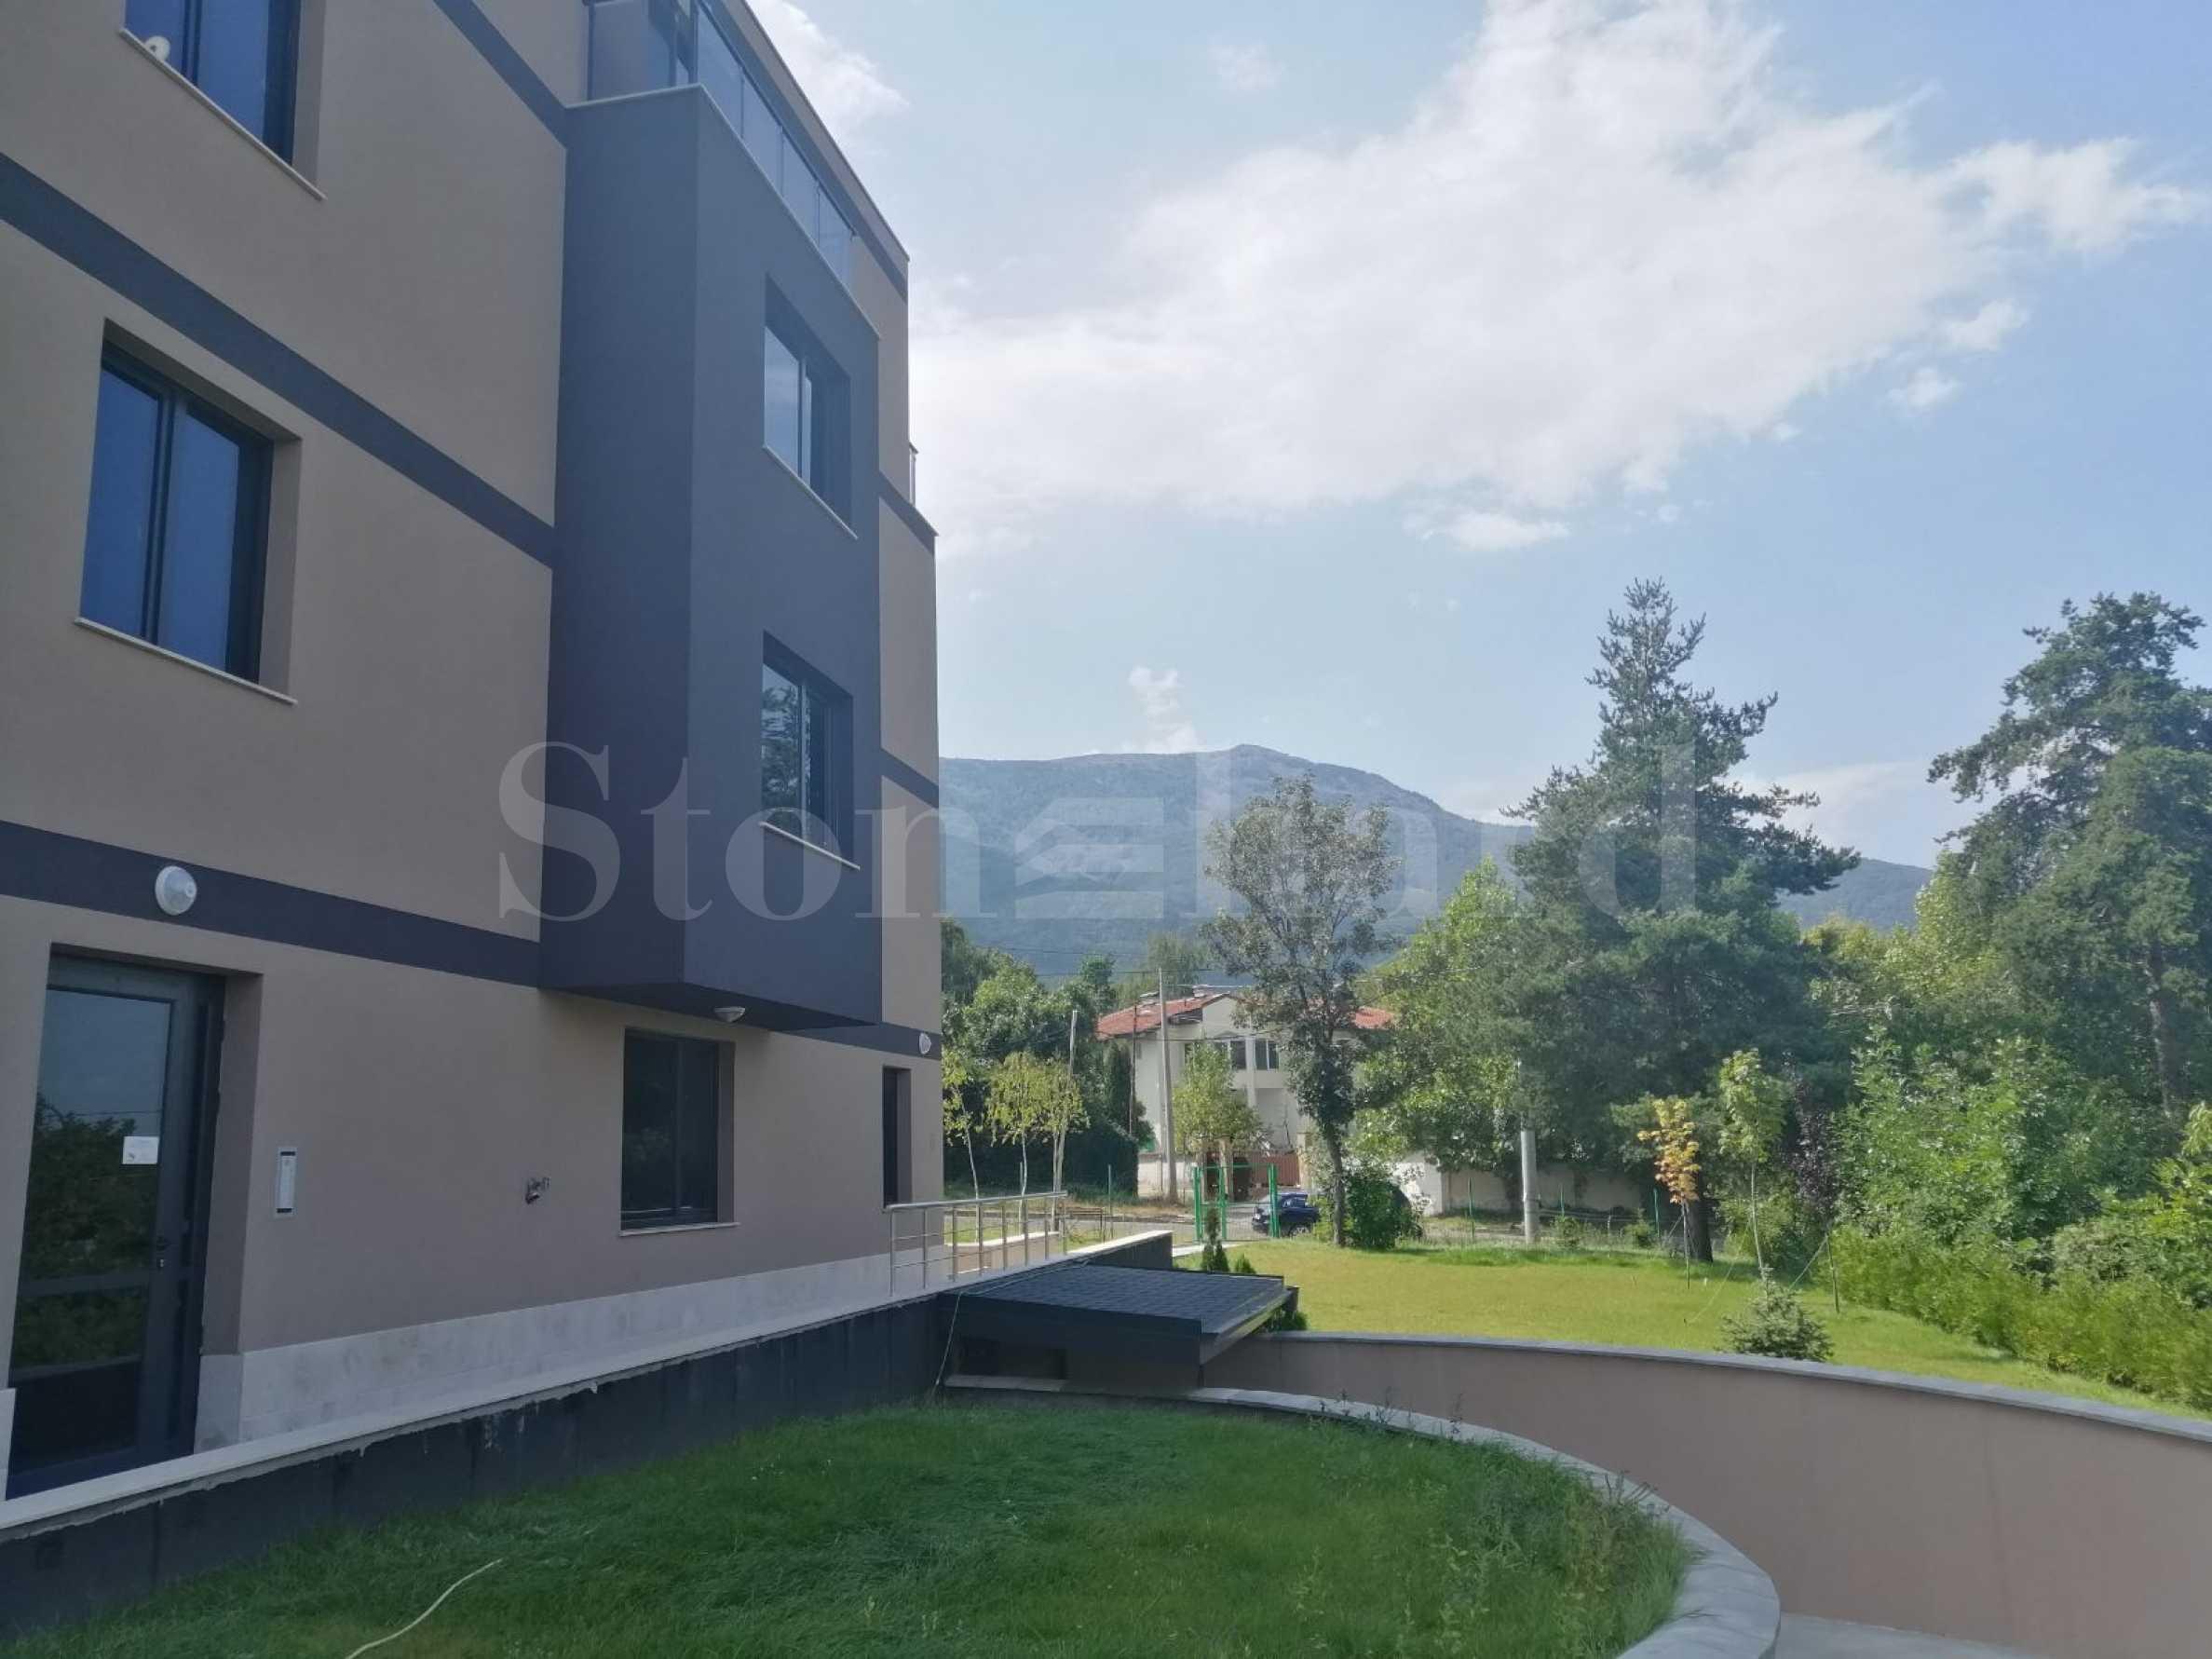 Нова жилищна сграда с гаражи до бул. Симеоновско шосе и Витоша1 - Stonehard